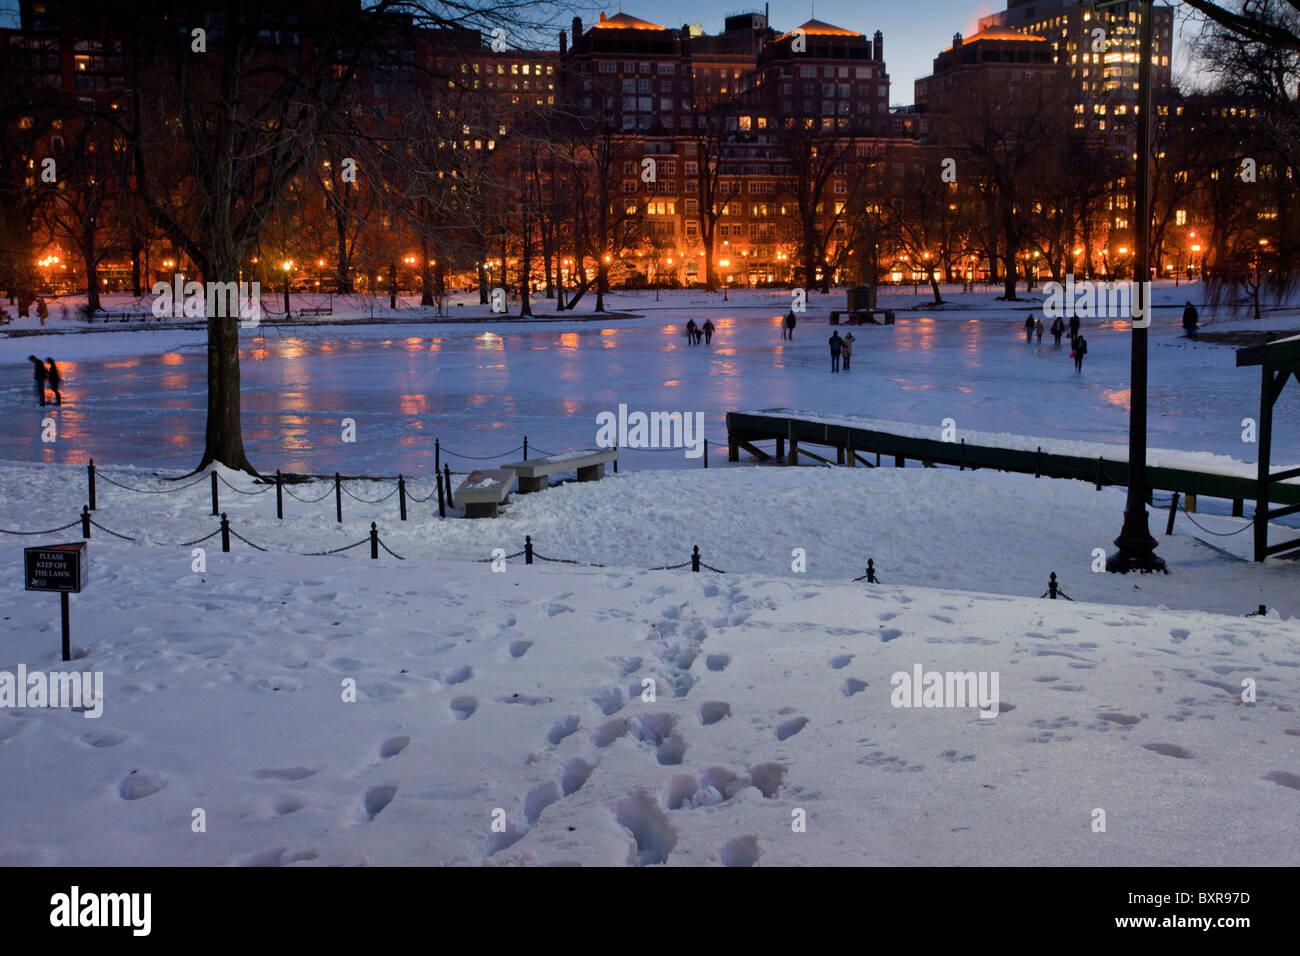 Christmas In Boston Massachusetts.Frozen Lagoon In The Public Gardens In Snow At Christmas